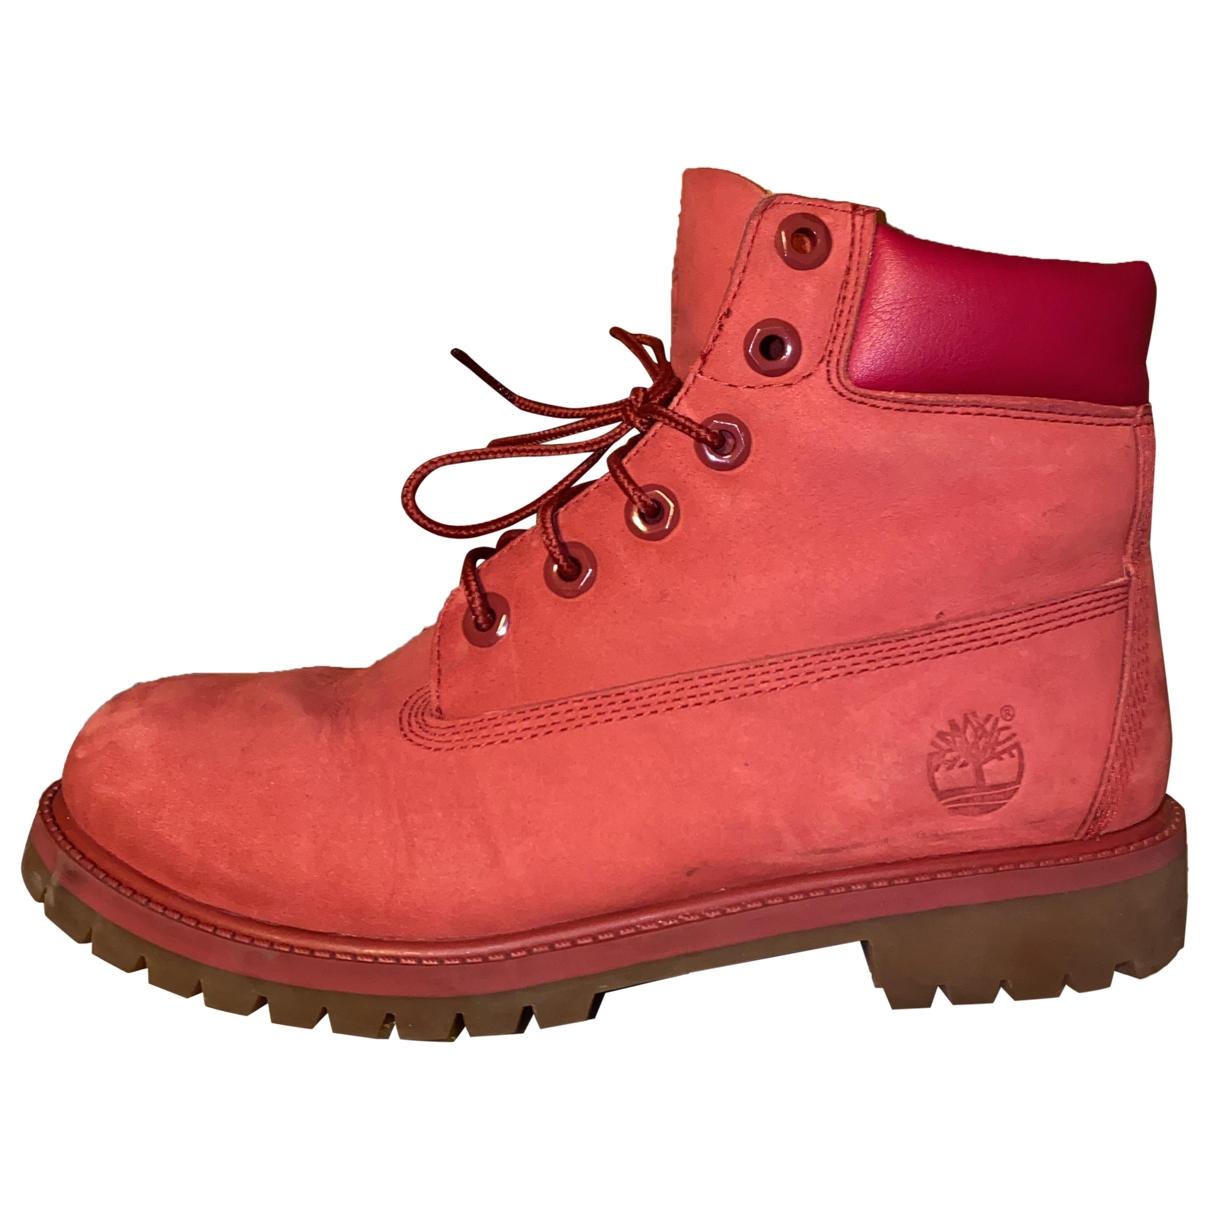 Timberland - Boots   pour femme en cuir - rouge